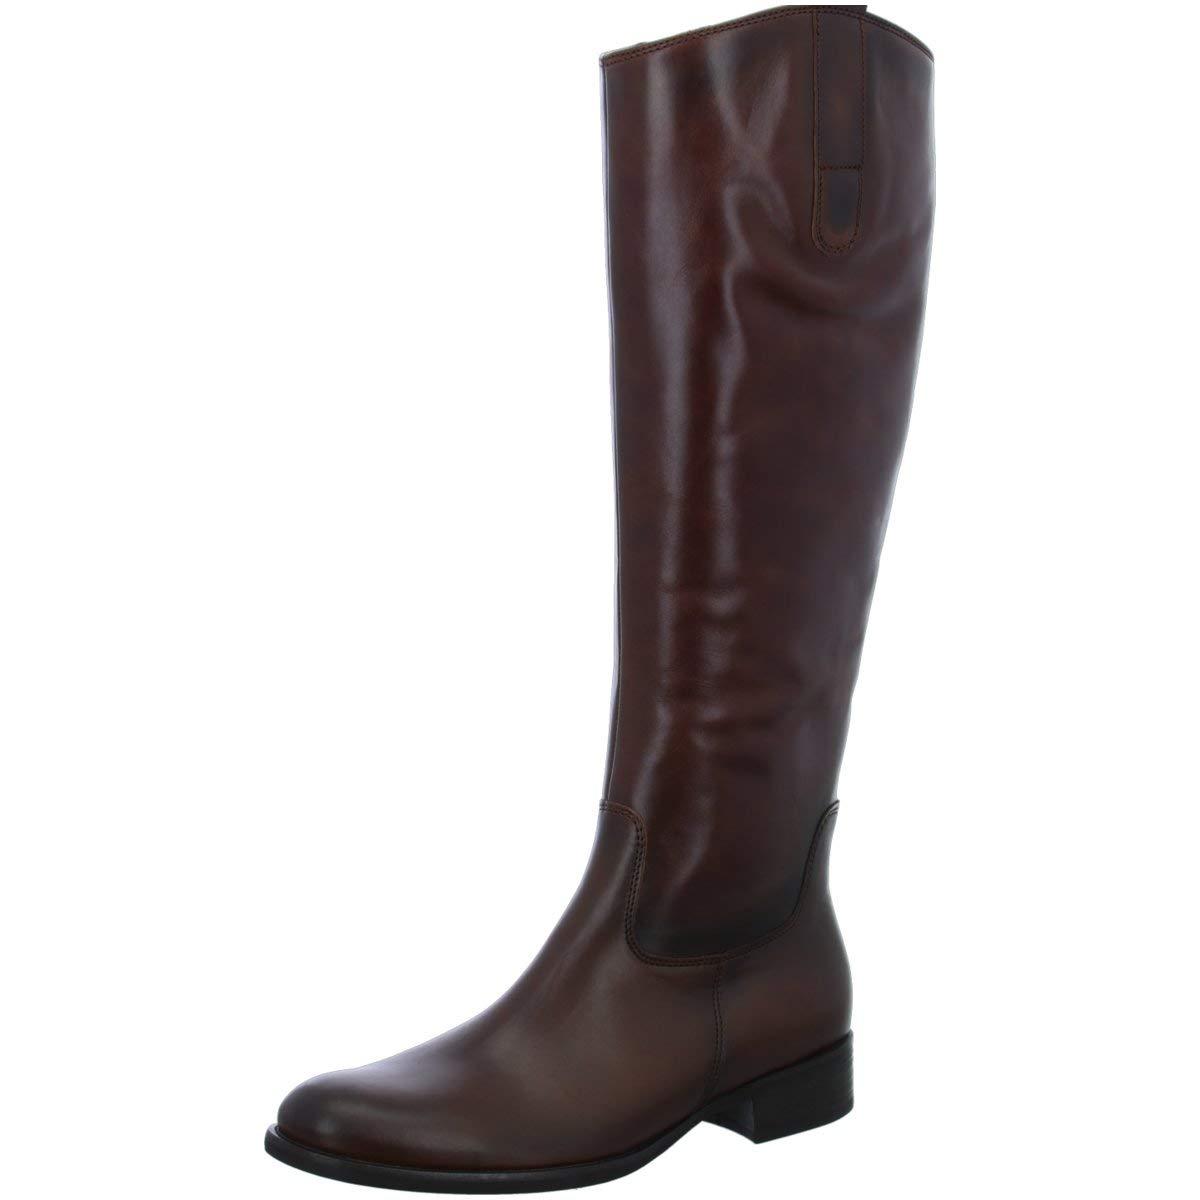 FashionBottes FemmeMarronsatteleffekt2237 Shoes Hautes Eu Gabor 3Aq5Lj4R